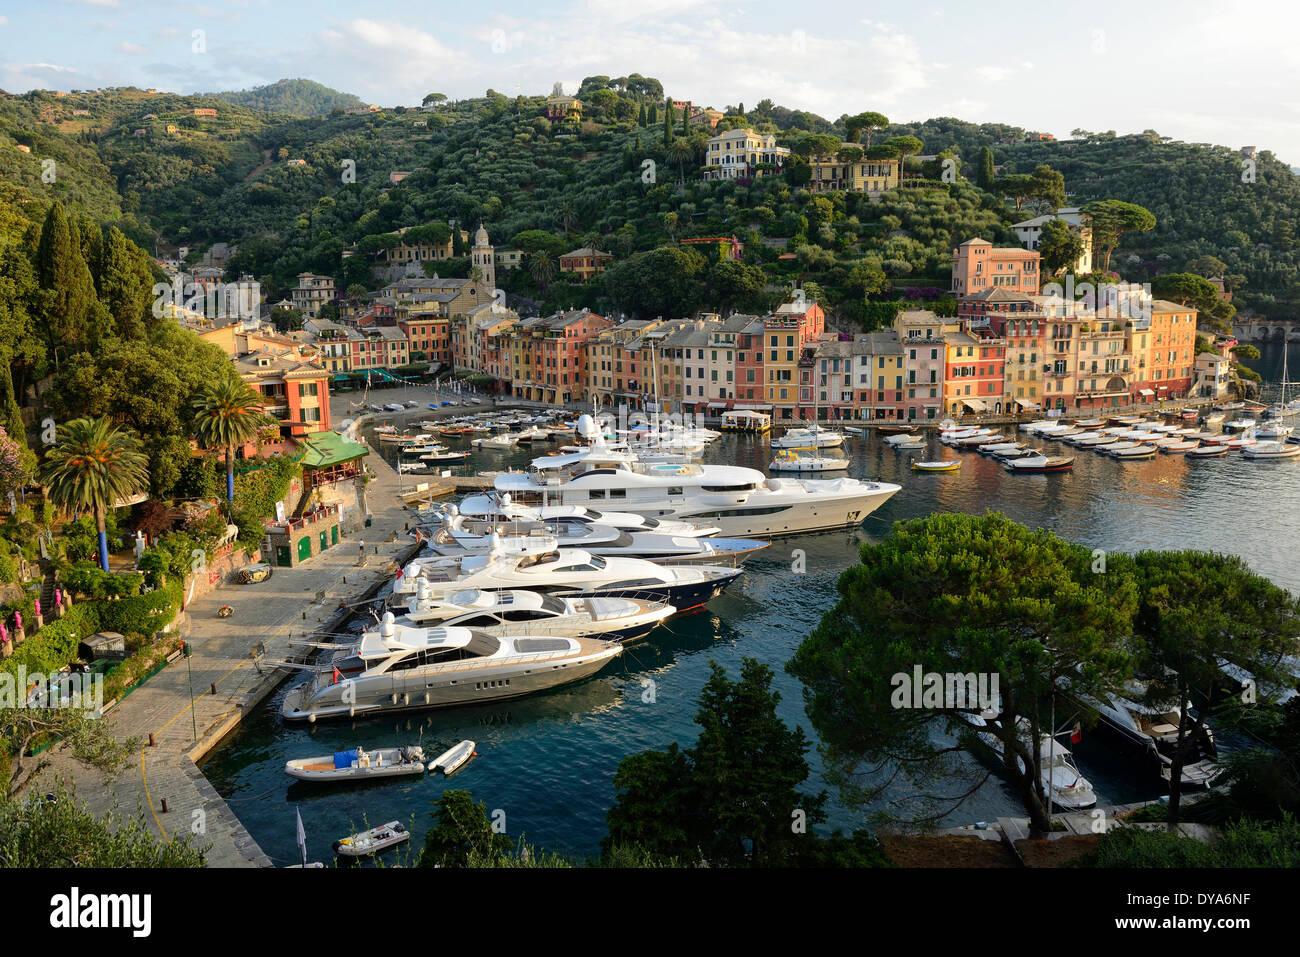 Italy, Riviera, Genoa province, Portofino, Mediterranean, marina, port, cove, town, landscape, coastal, italian - Stock Image